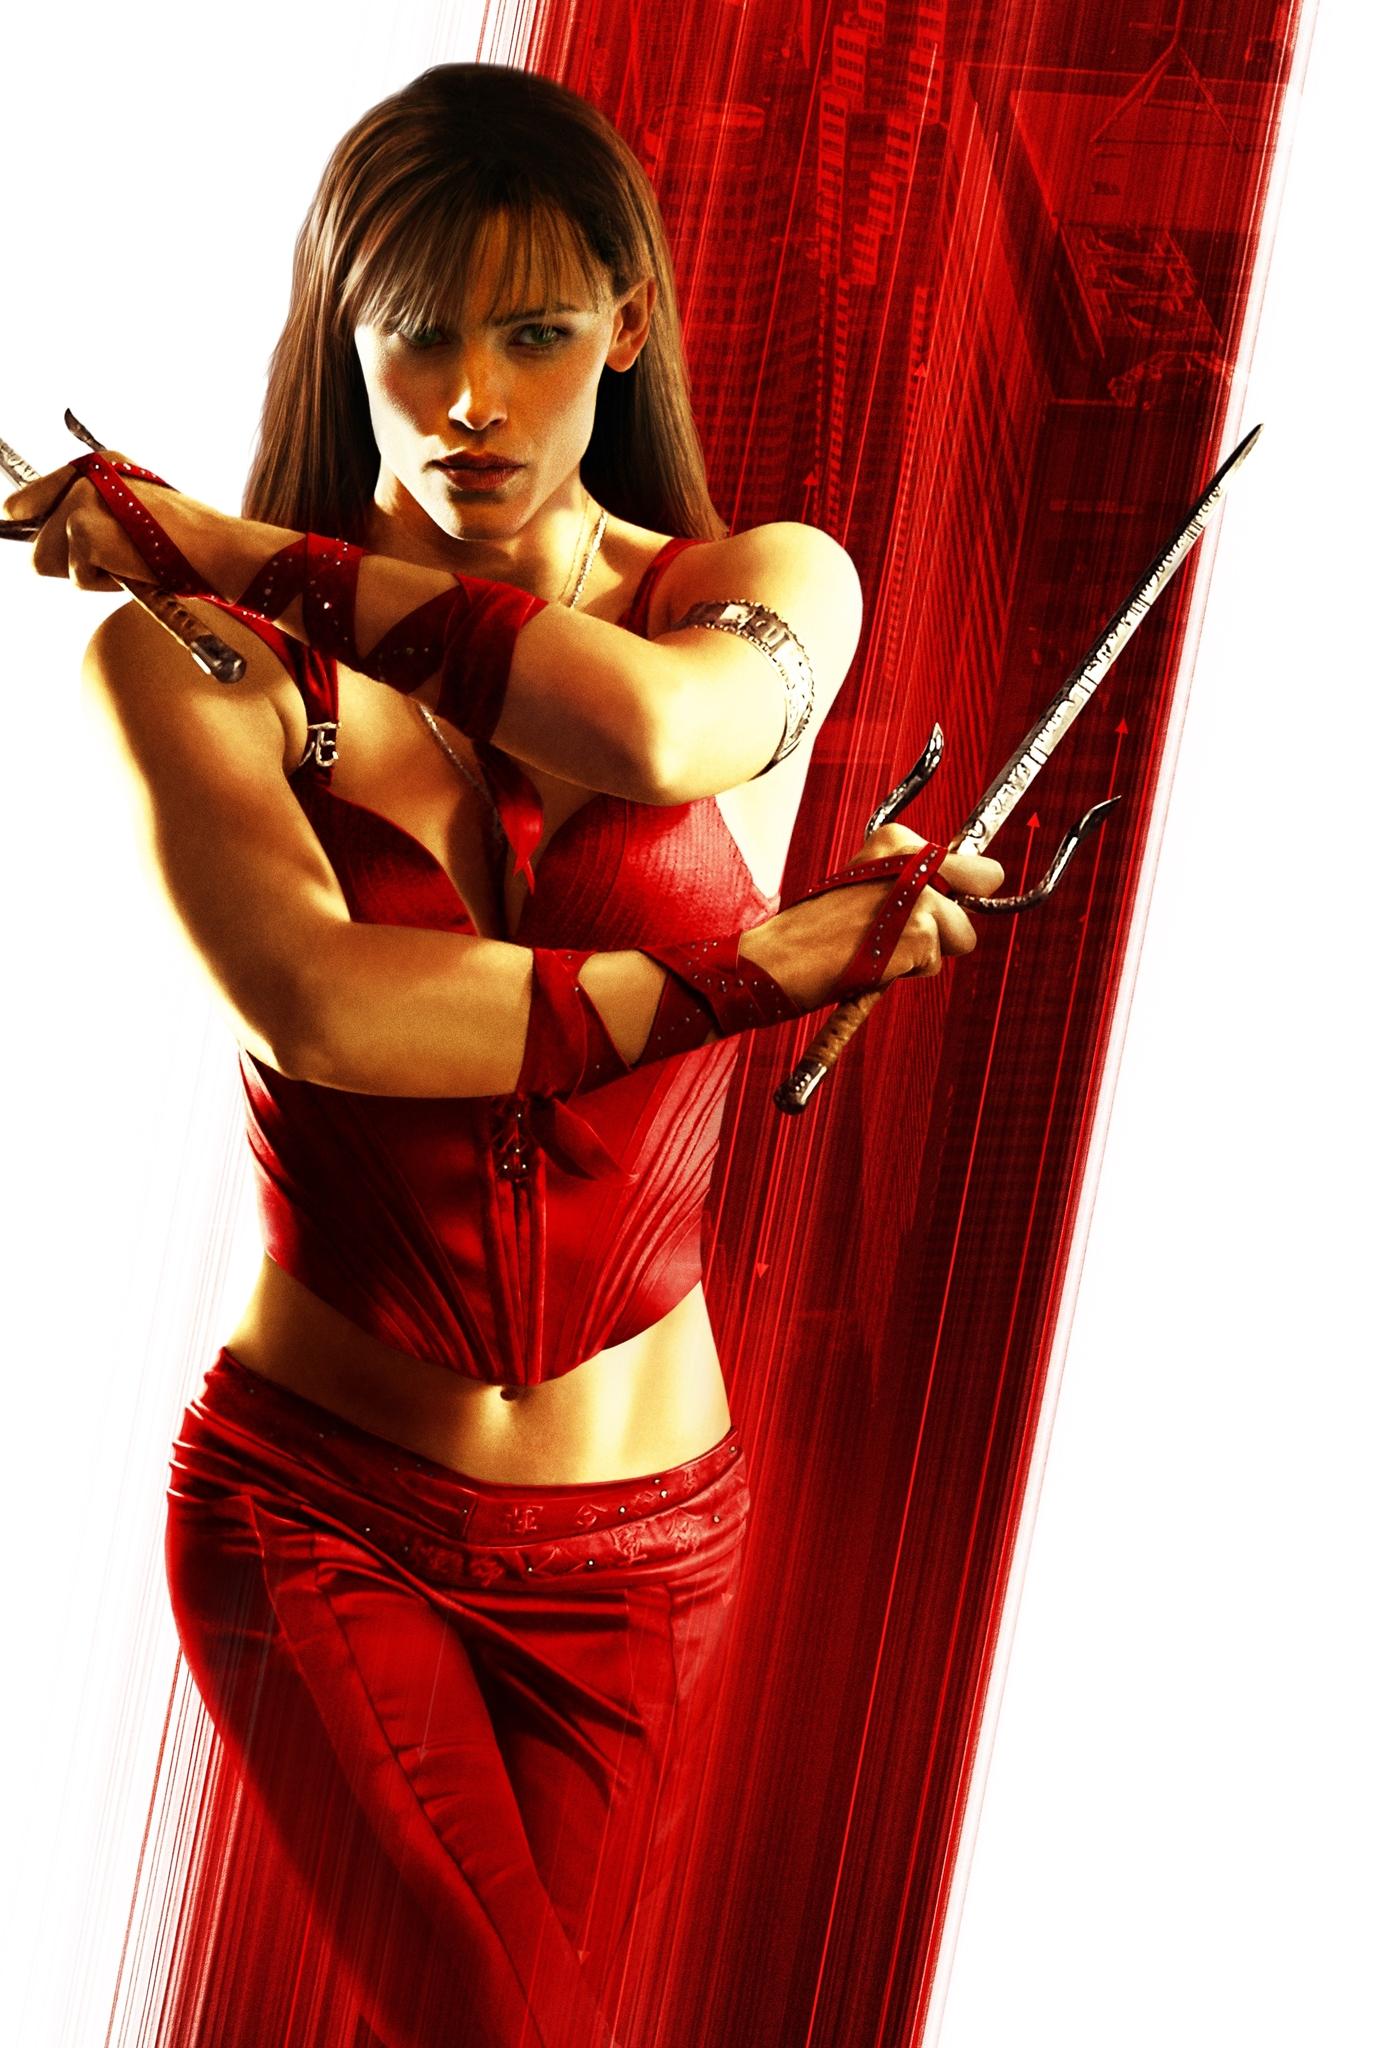 Elektra Natchios (Earth-701306)